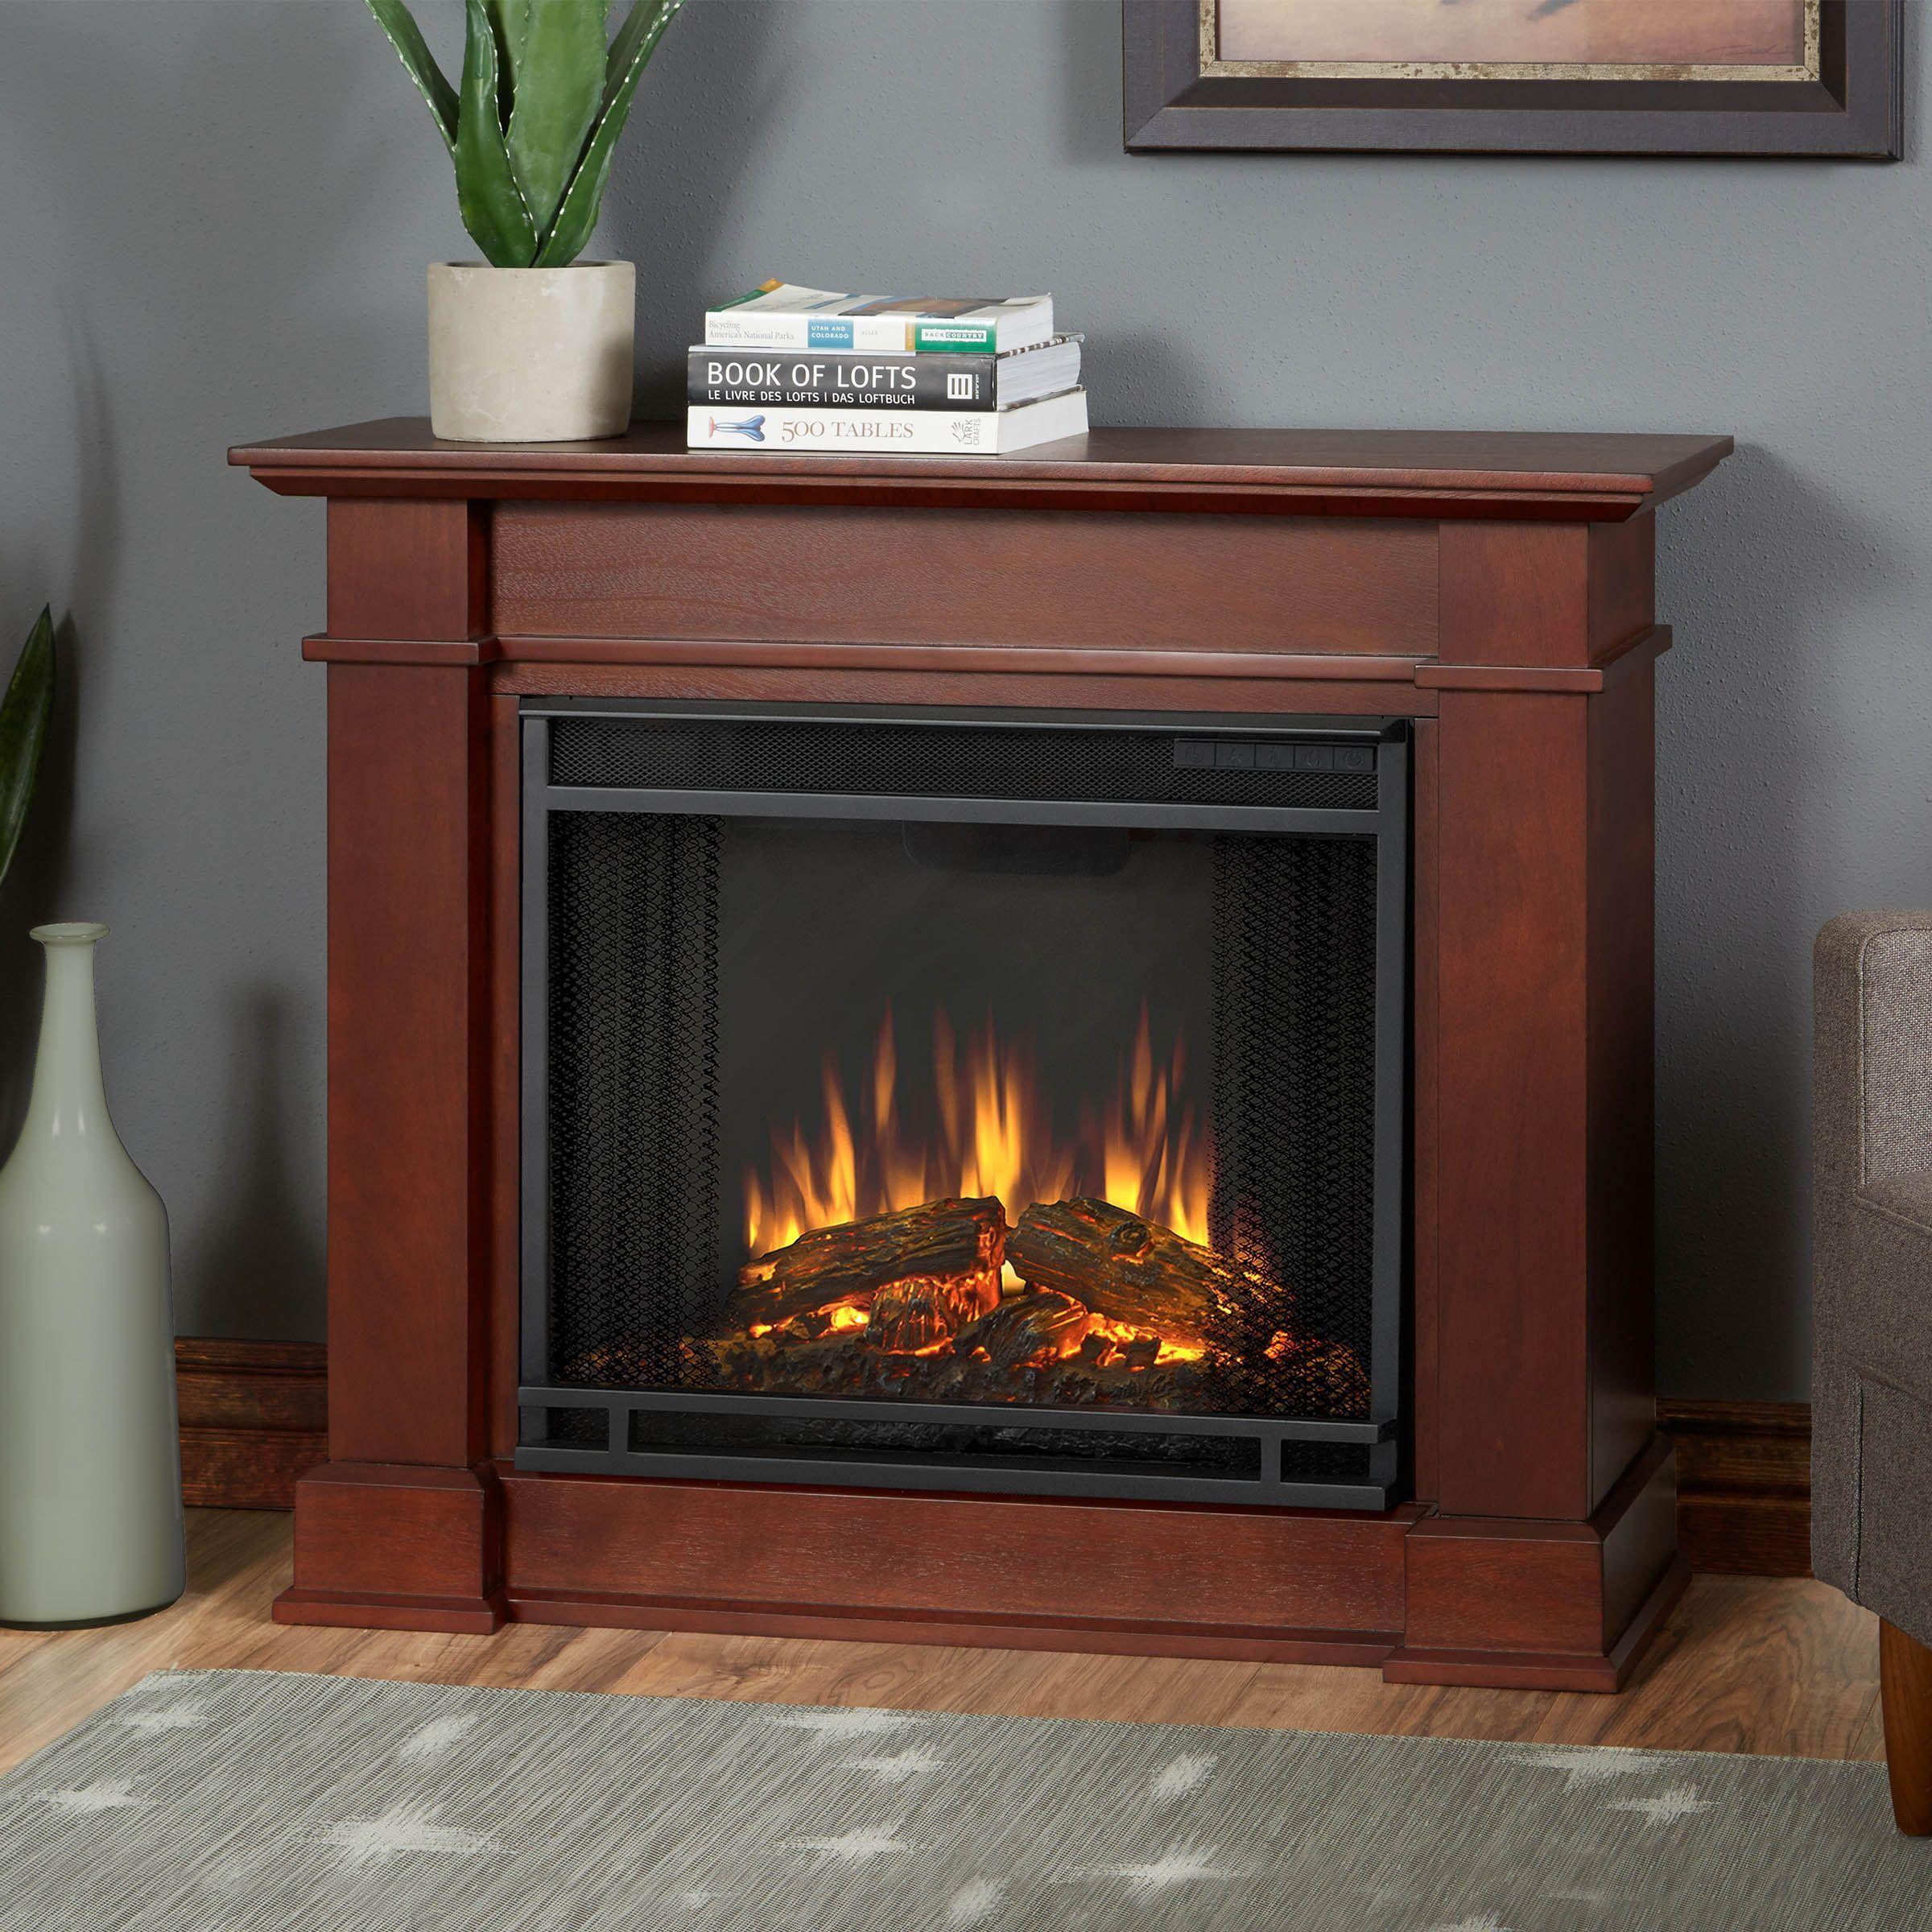 Real Flame Devin Dark Espresso 36.3 in. W x 11 in. D x 30.4 in. H Electric Fireplace (Real Flame Devin Electric Fireplace Dk. Espresso), Brown (MDF)